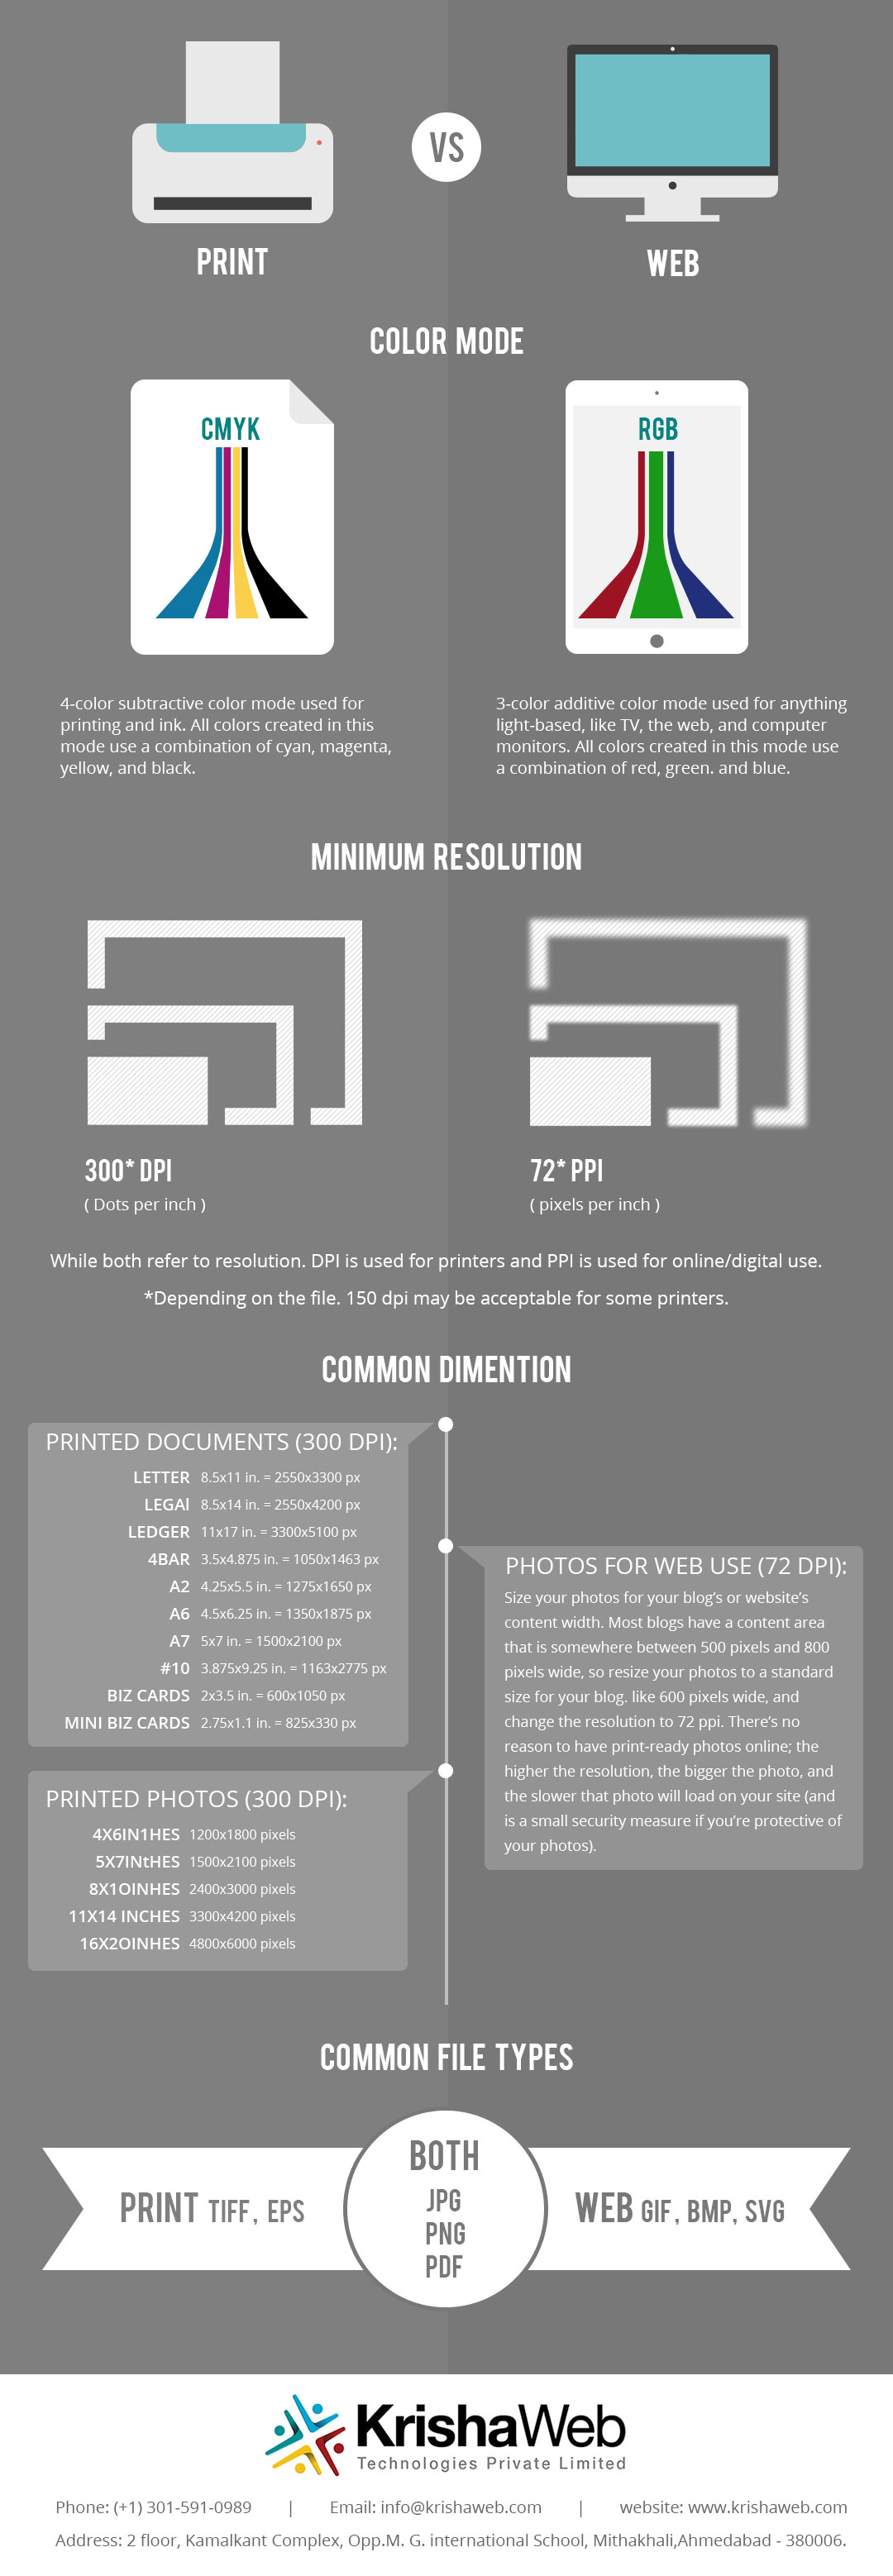 Print versus Web